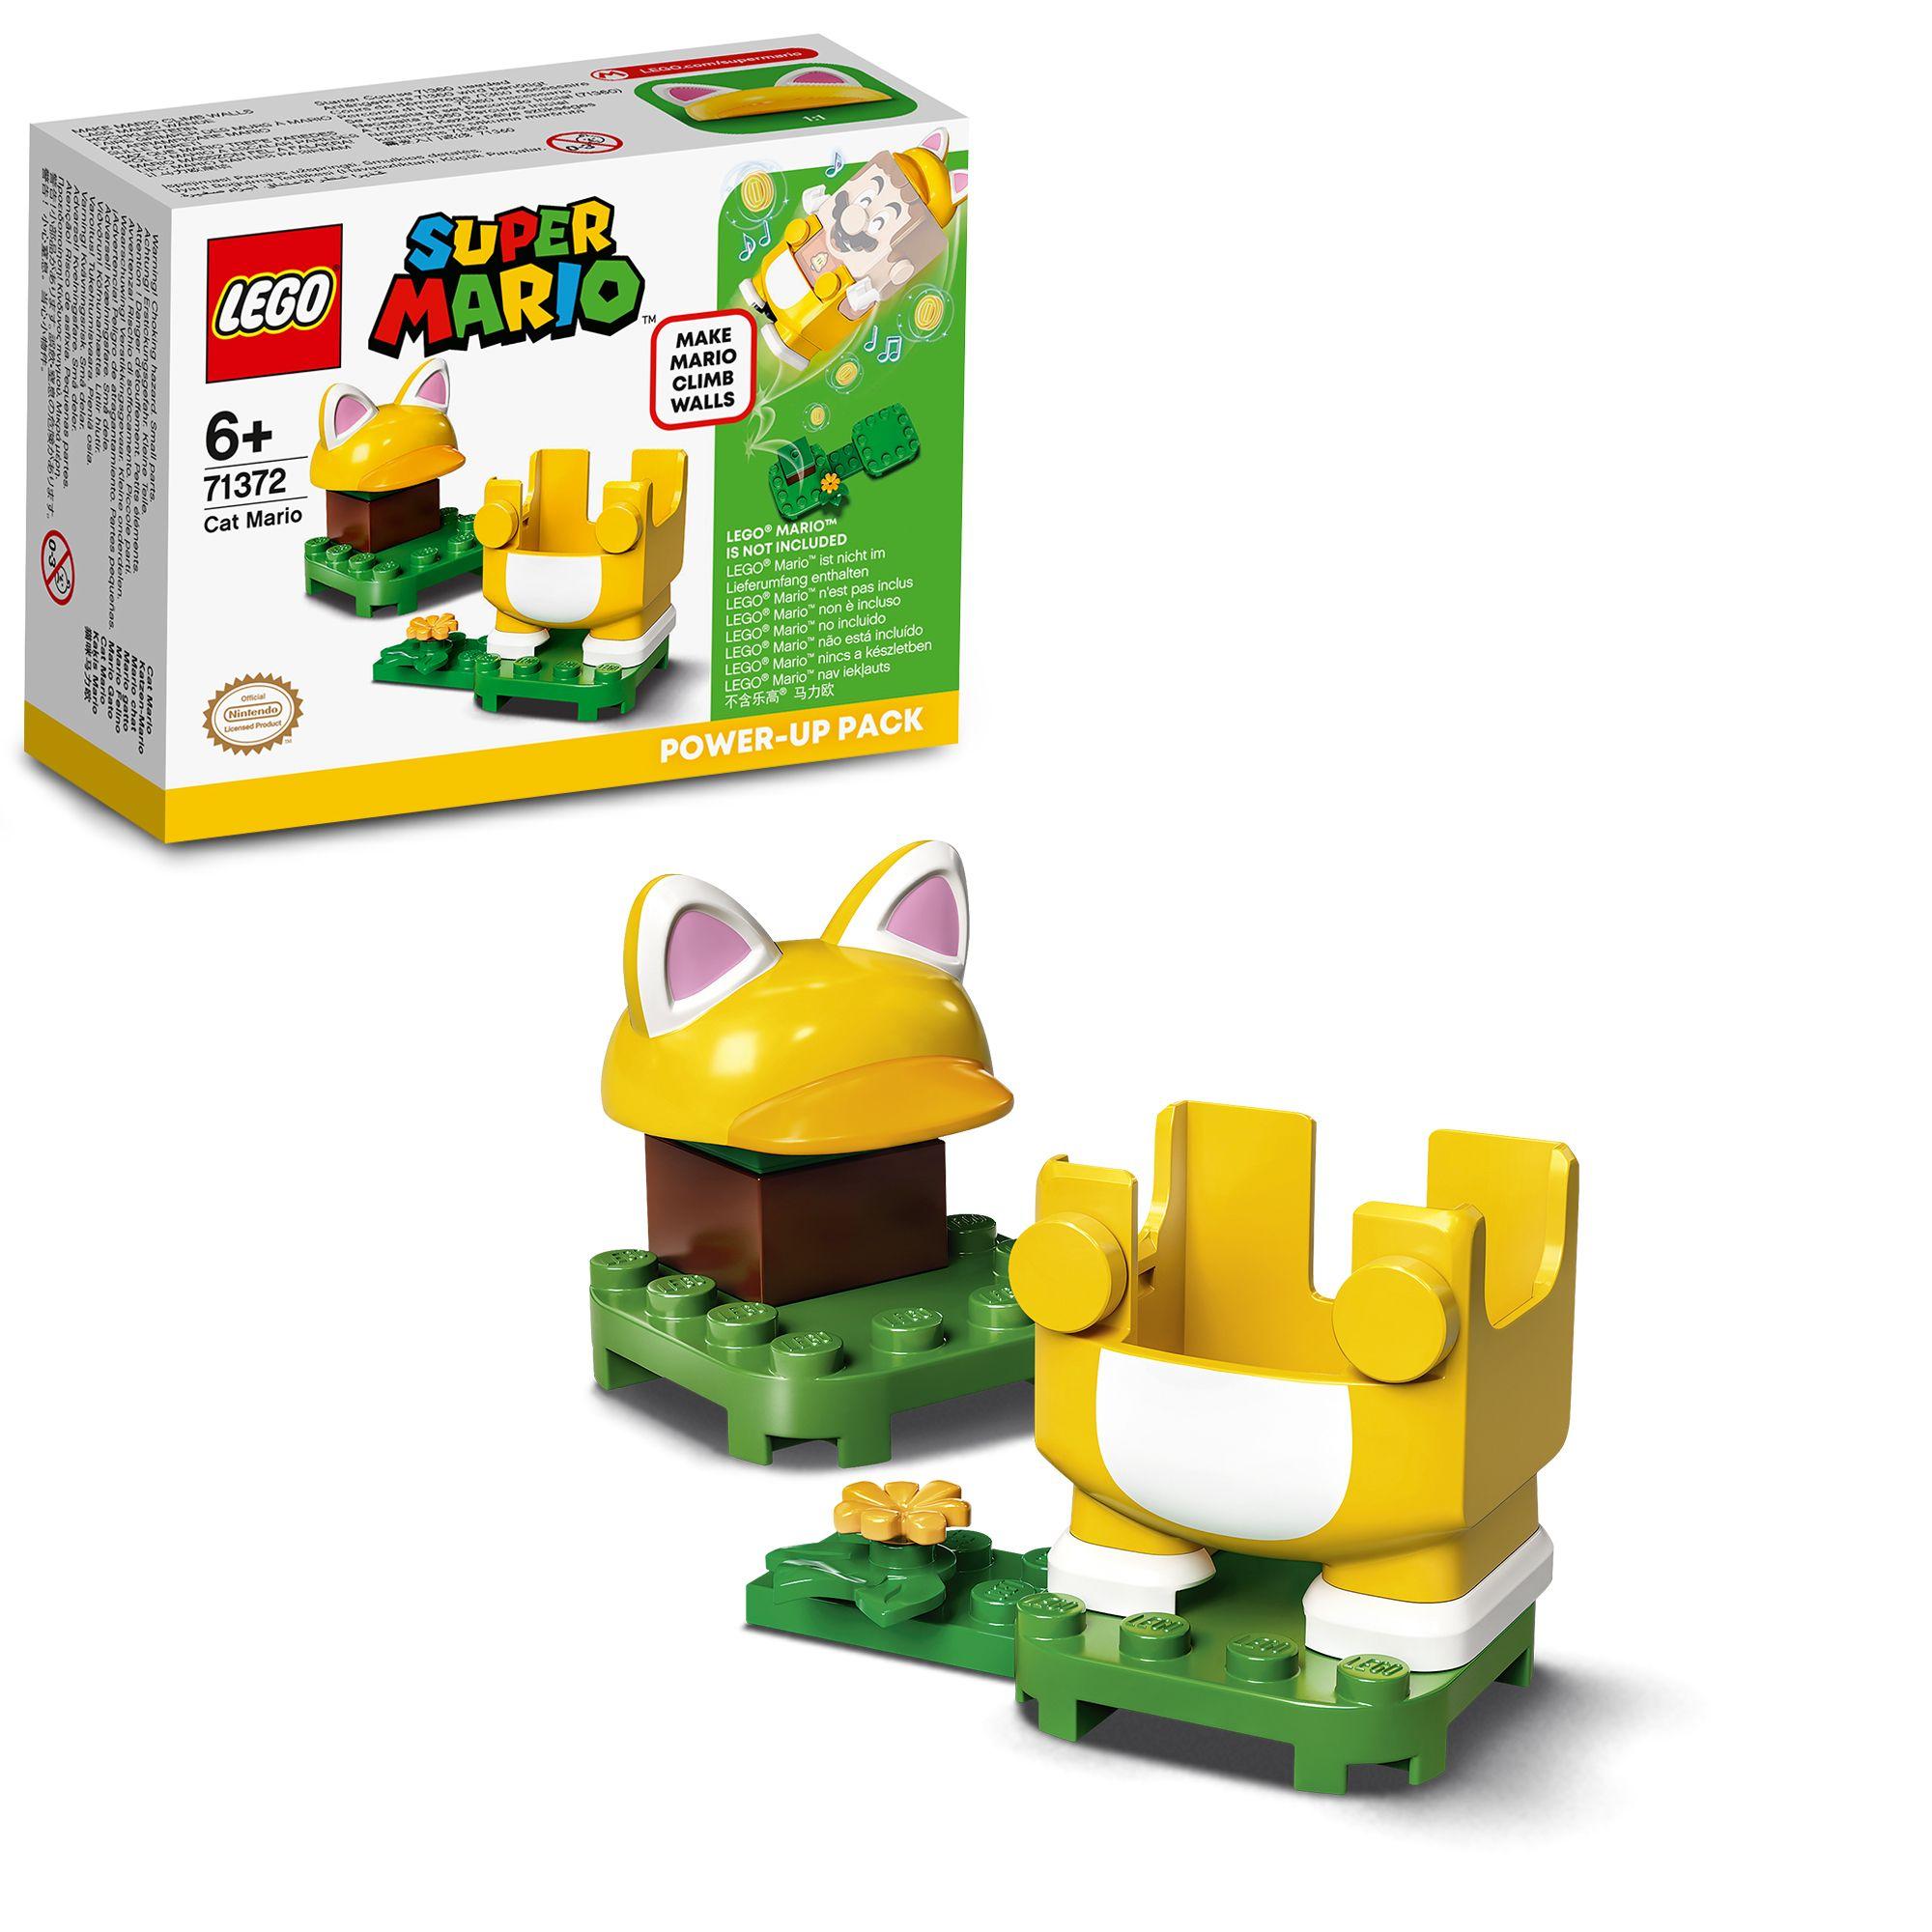 Lego super mario mario gatto - power up pack - 71372 - Super Mario